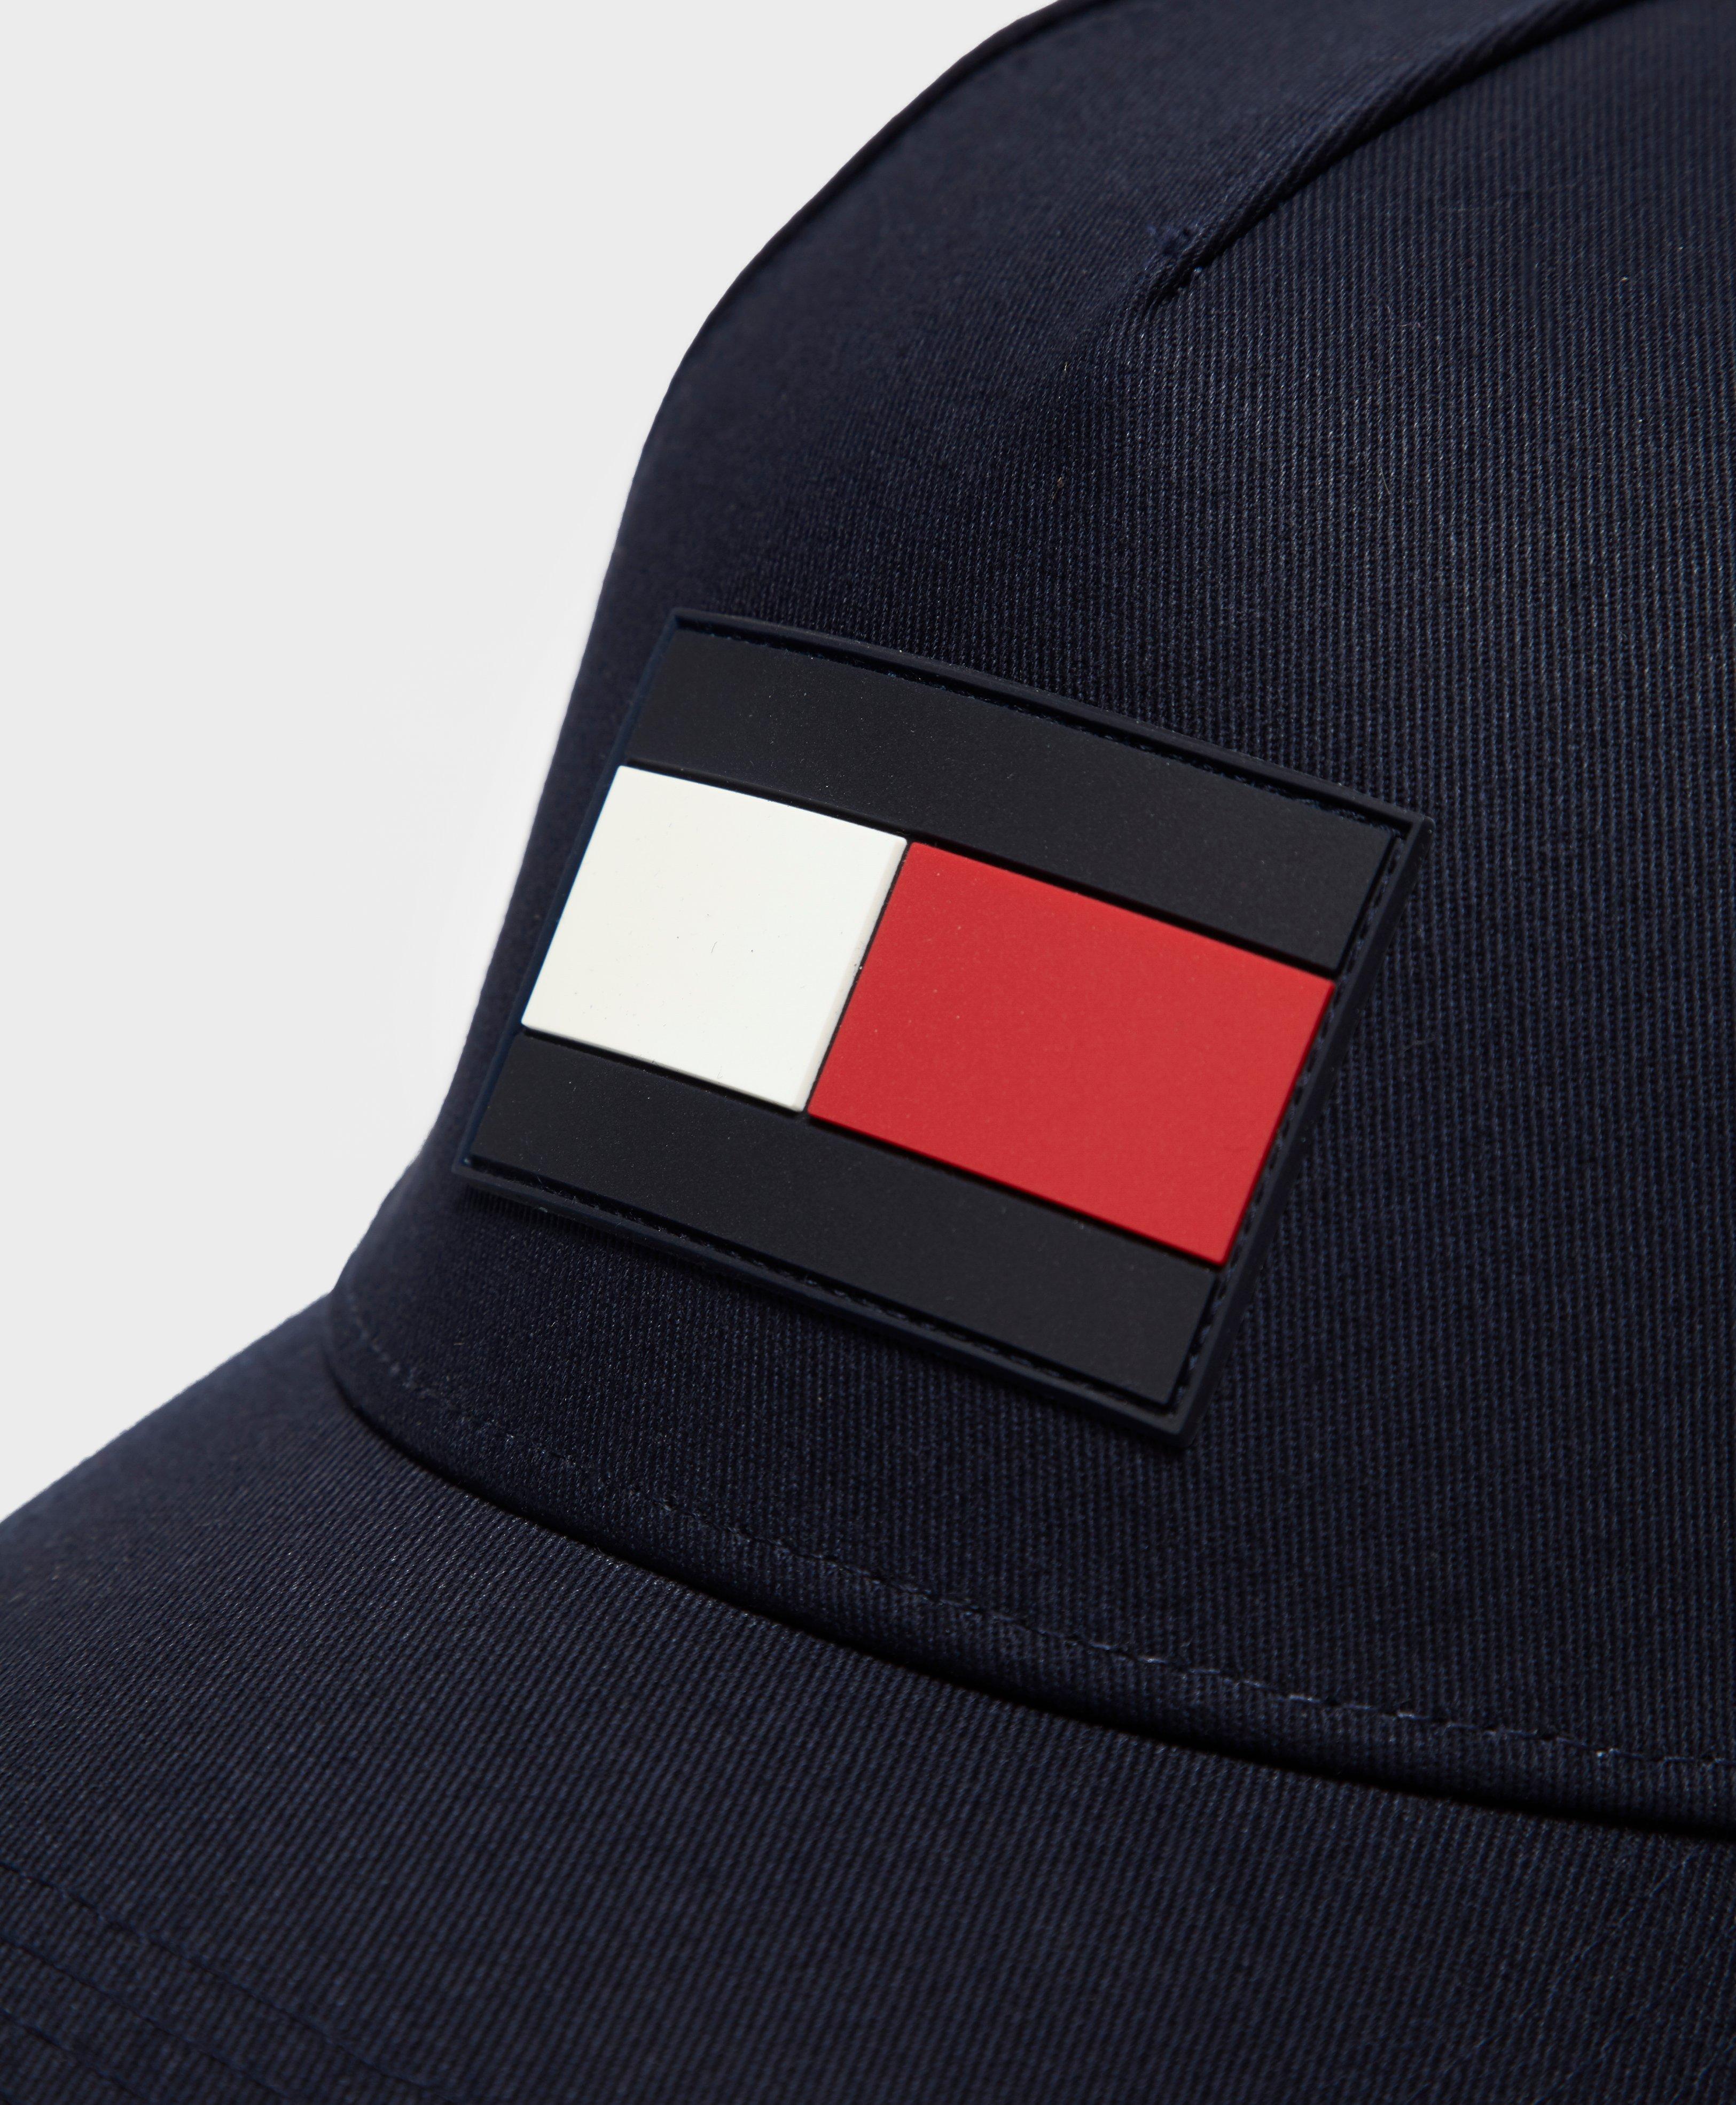 ... Lyst - Tommy Hilfiger Large Flag Cap in Blue for Men finest selection  c7438 b998d ... 49843837add5